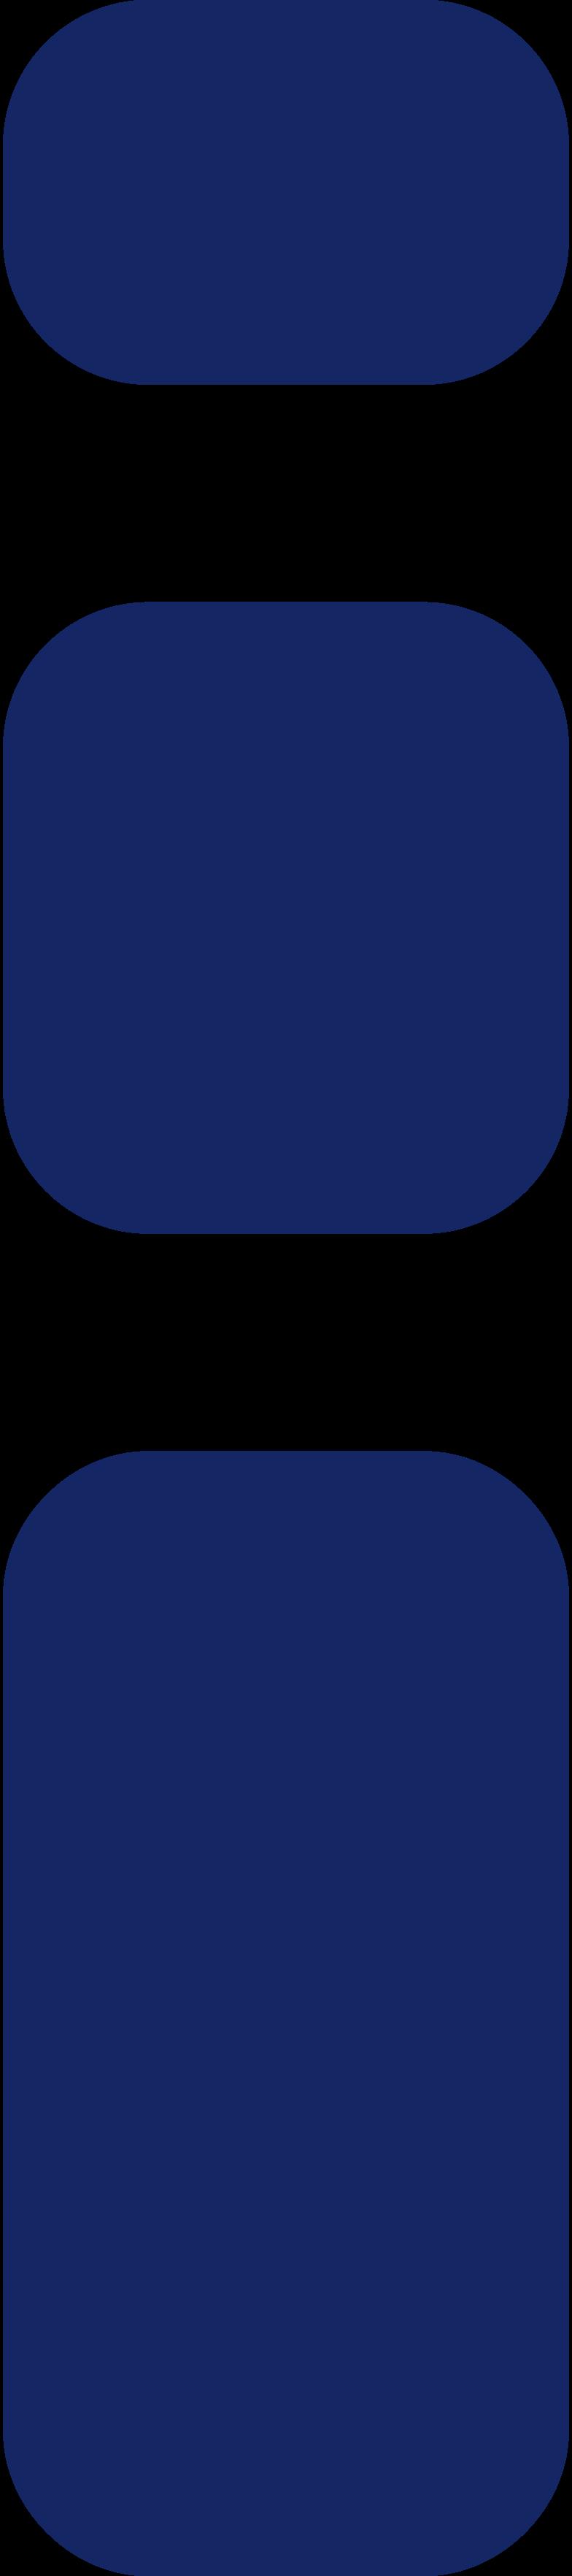 rectangles Clipart illustration in PNG, SVG